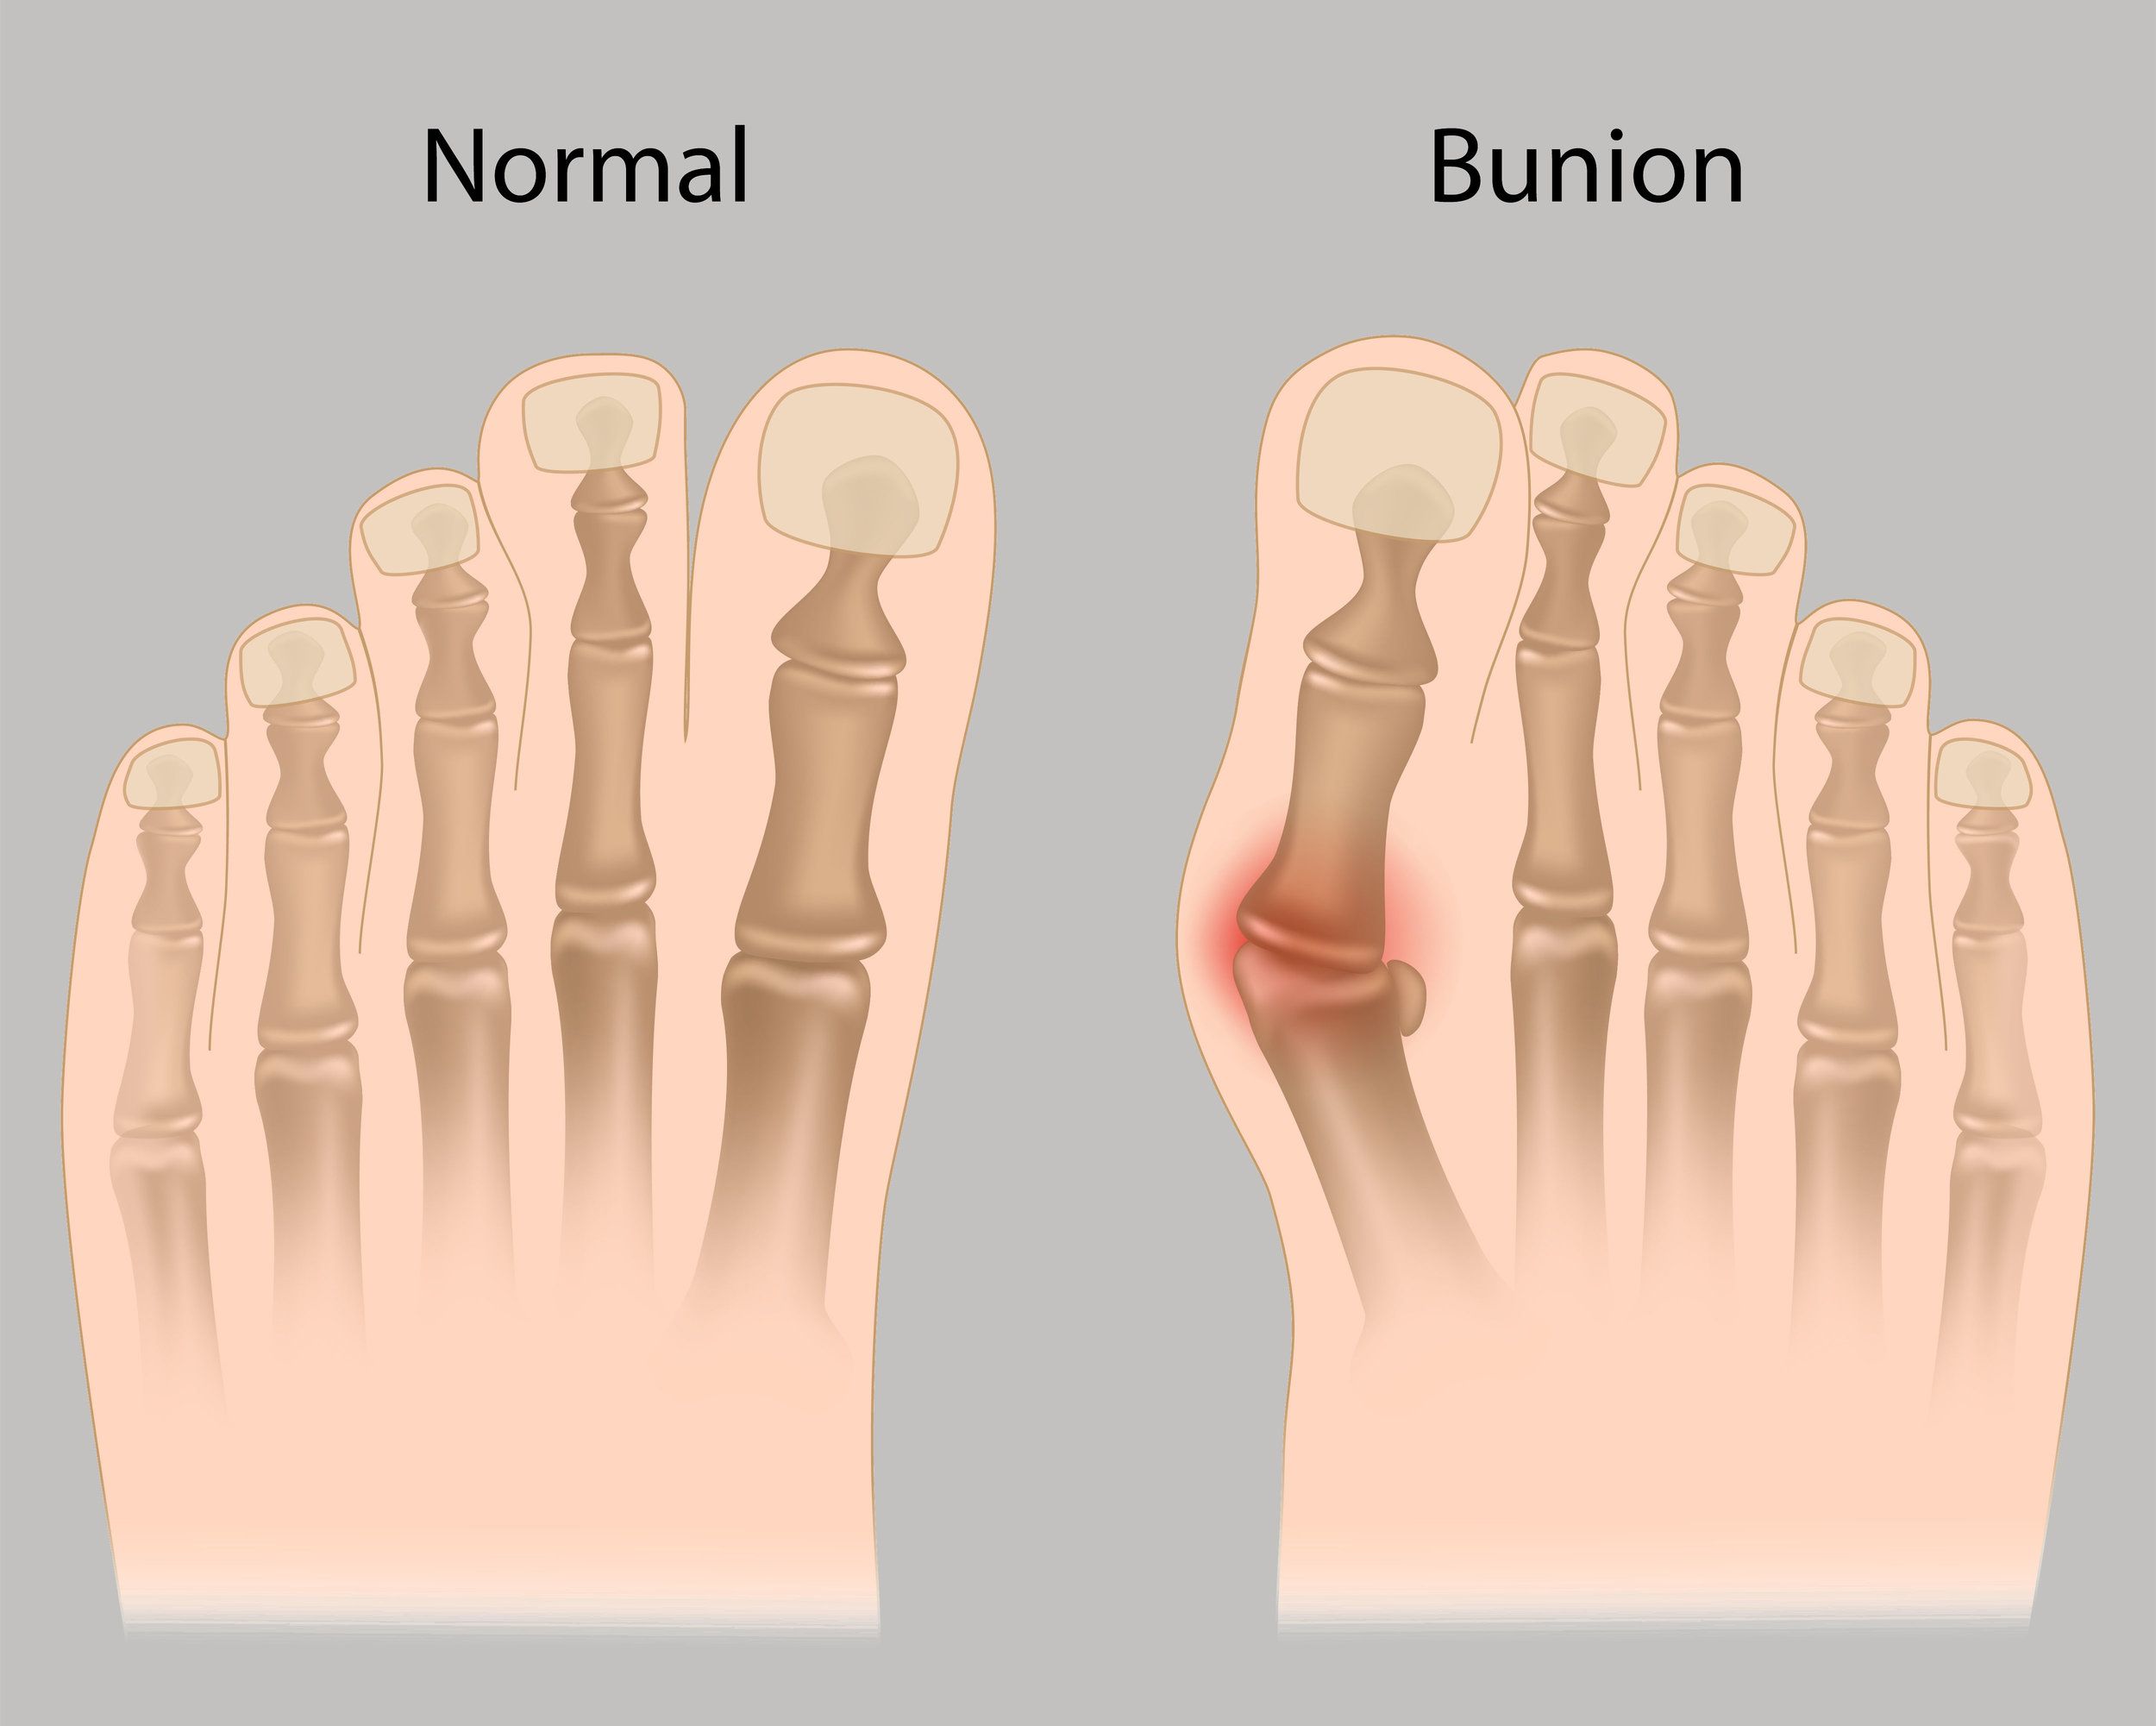 bunion-doctor-surgeon